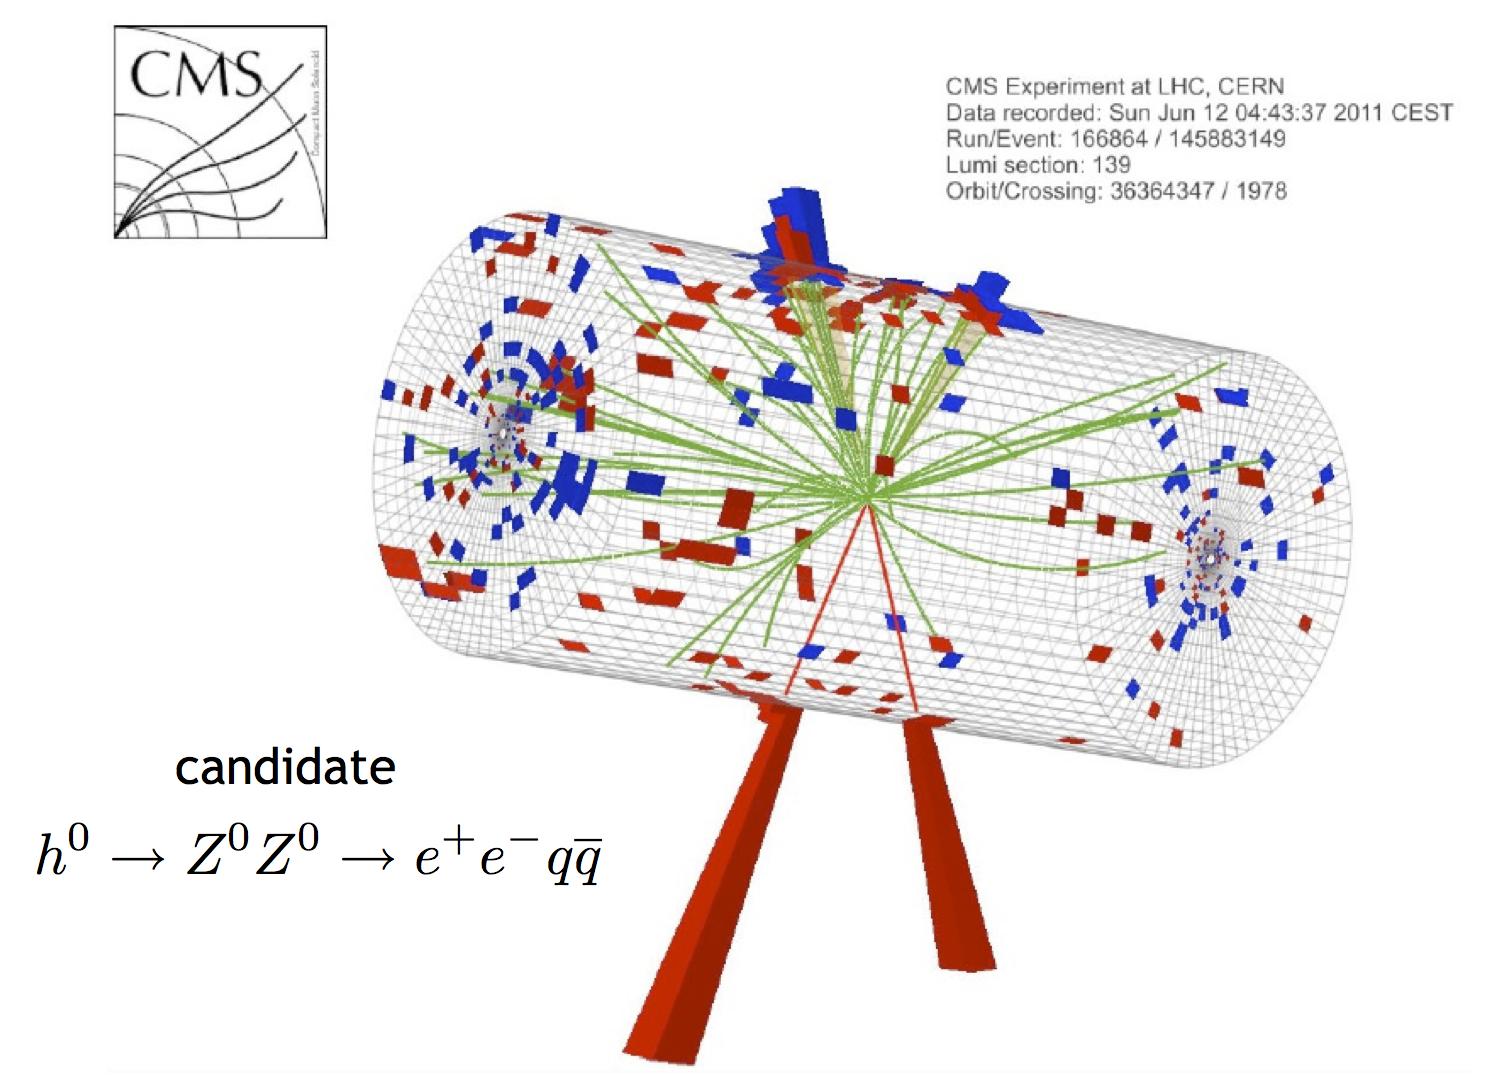 Quantum Diaries Simple Electric Motor Diagram Schoolphysics Welcome It